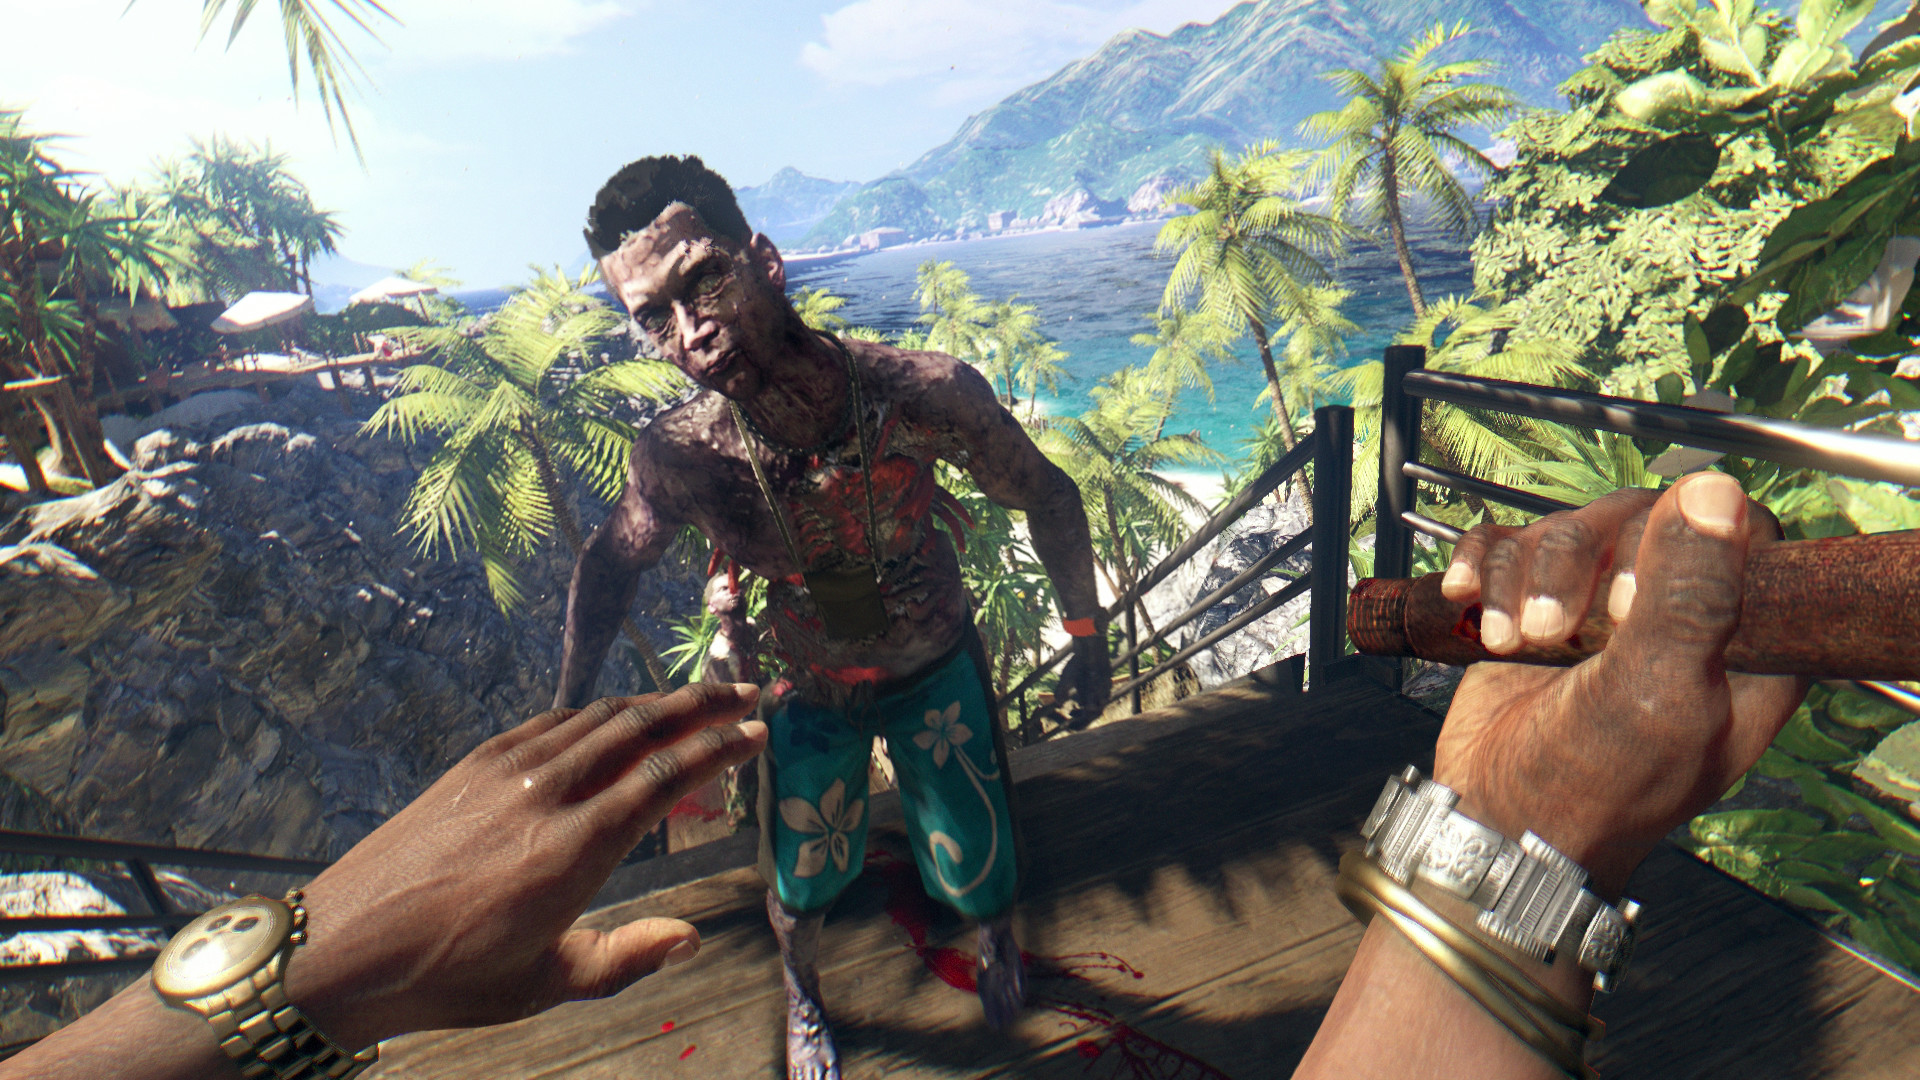 Dead island 2 pc games torrents.